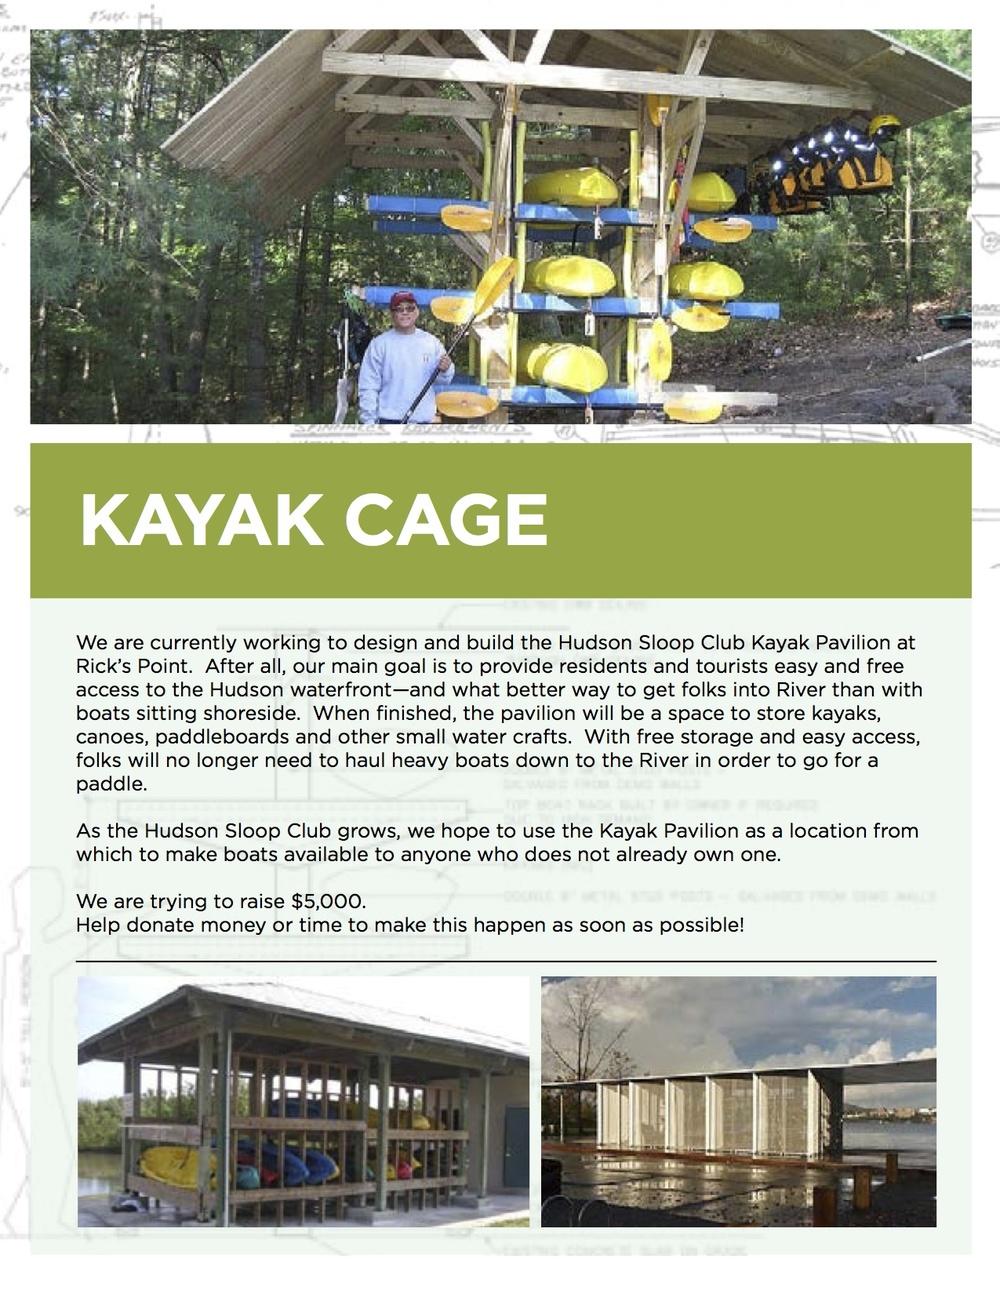 KayakCage.jpg